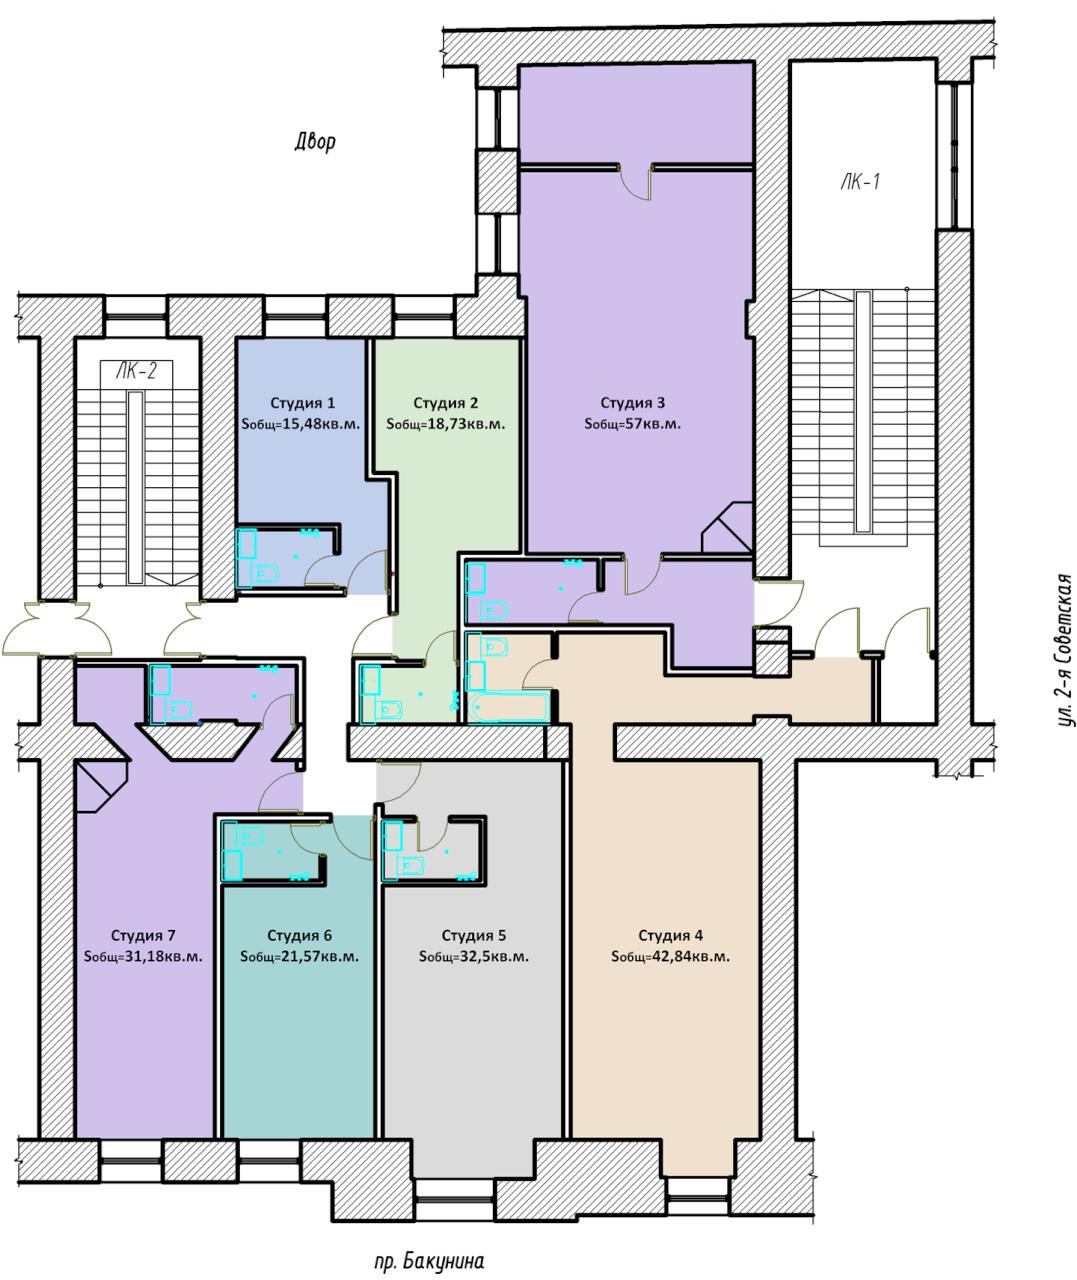 Планировки квартир-студий в центре на проспекте Бакунина 2